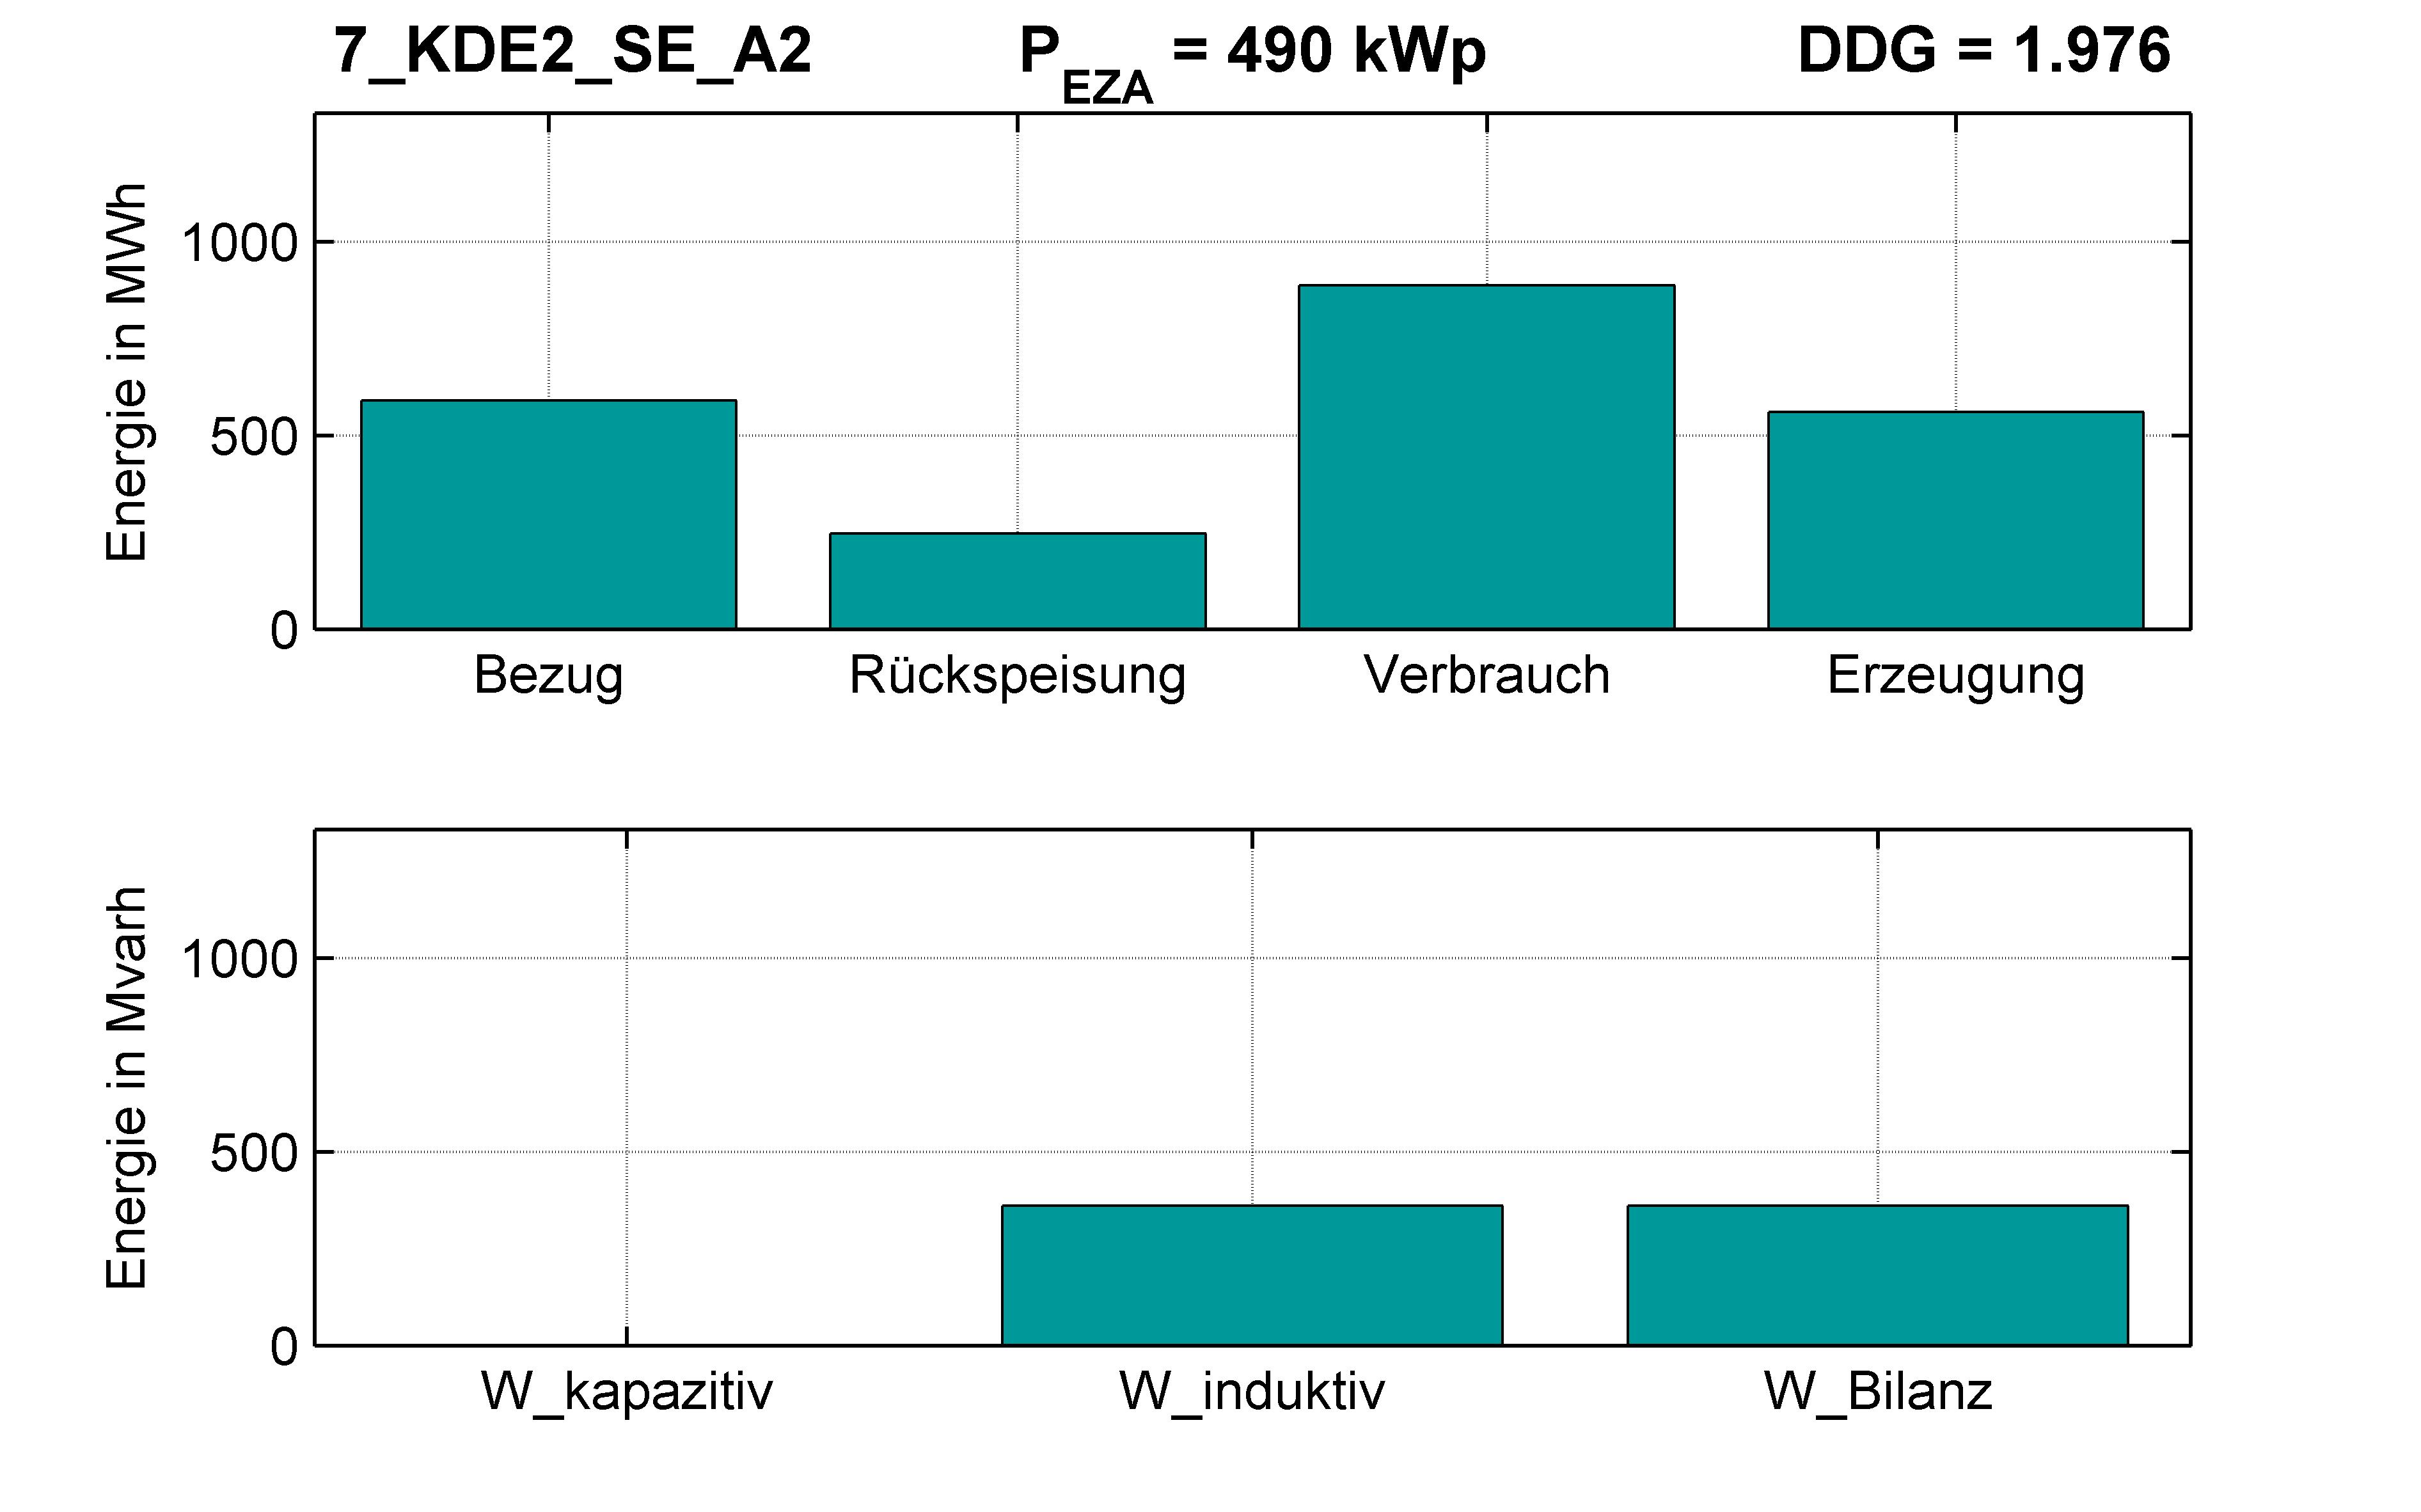 KDE2 | Längsregler (SE) A2 | PQ-Bilanz